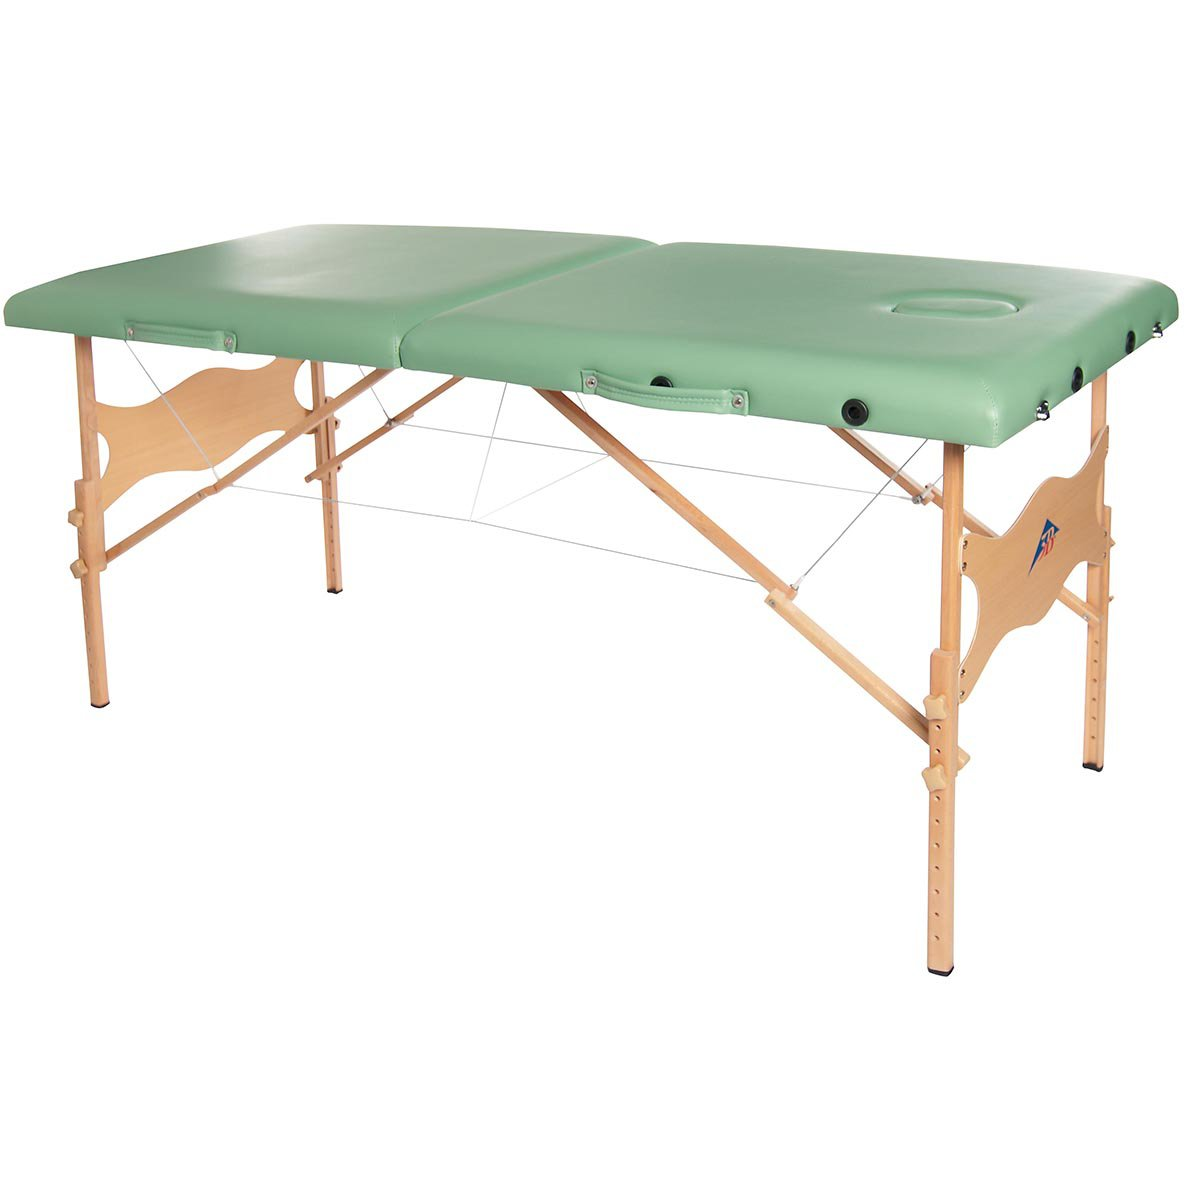 3B Scientific W60601G-1 Wood Basic Portable Massage Table, 550lbs Capacity, 25''-33'' Adjustable Height, Green